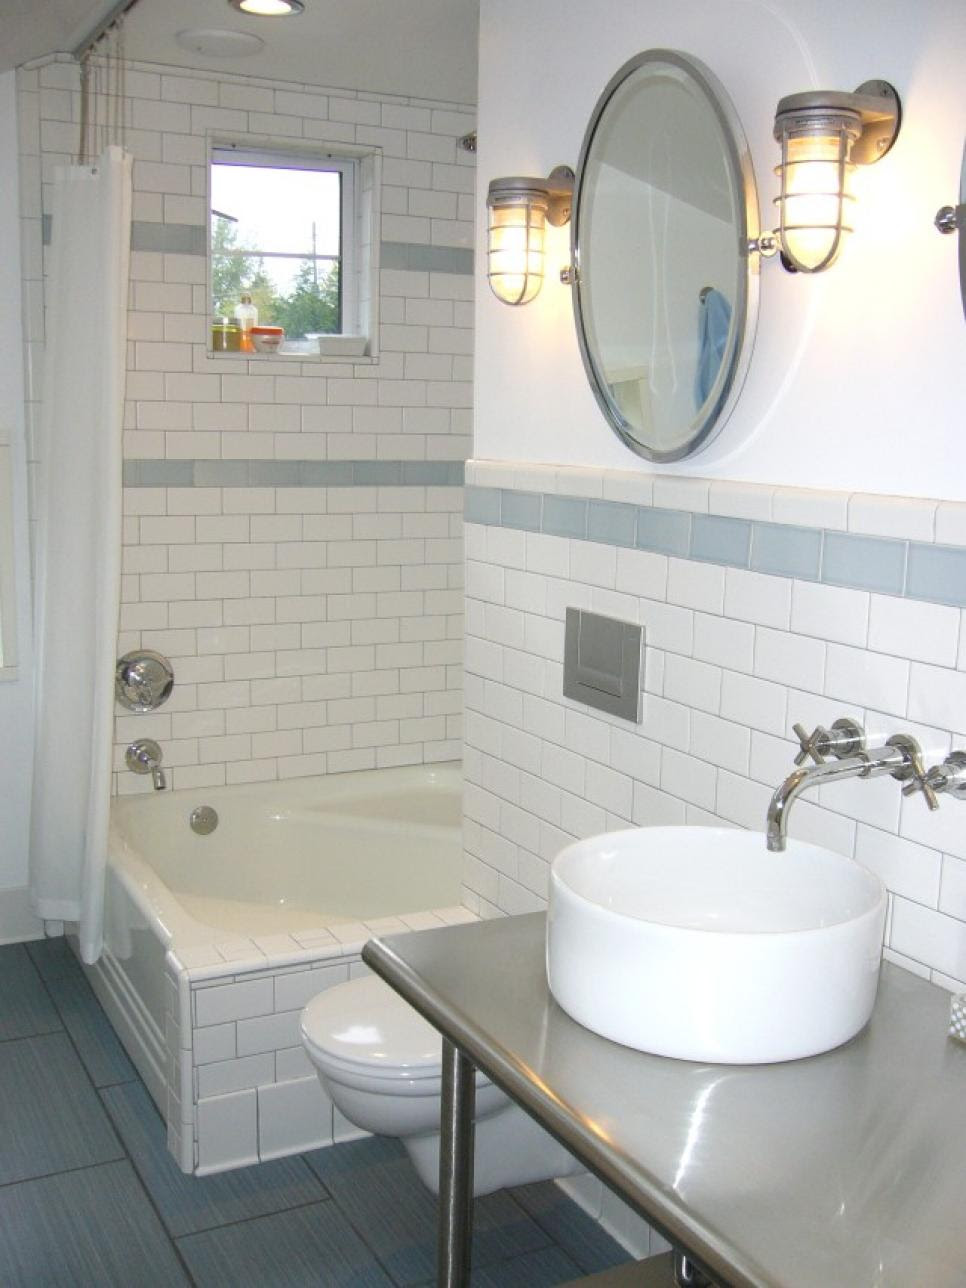 Beautiful Bathroom Redos on a Budget | DIY